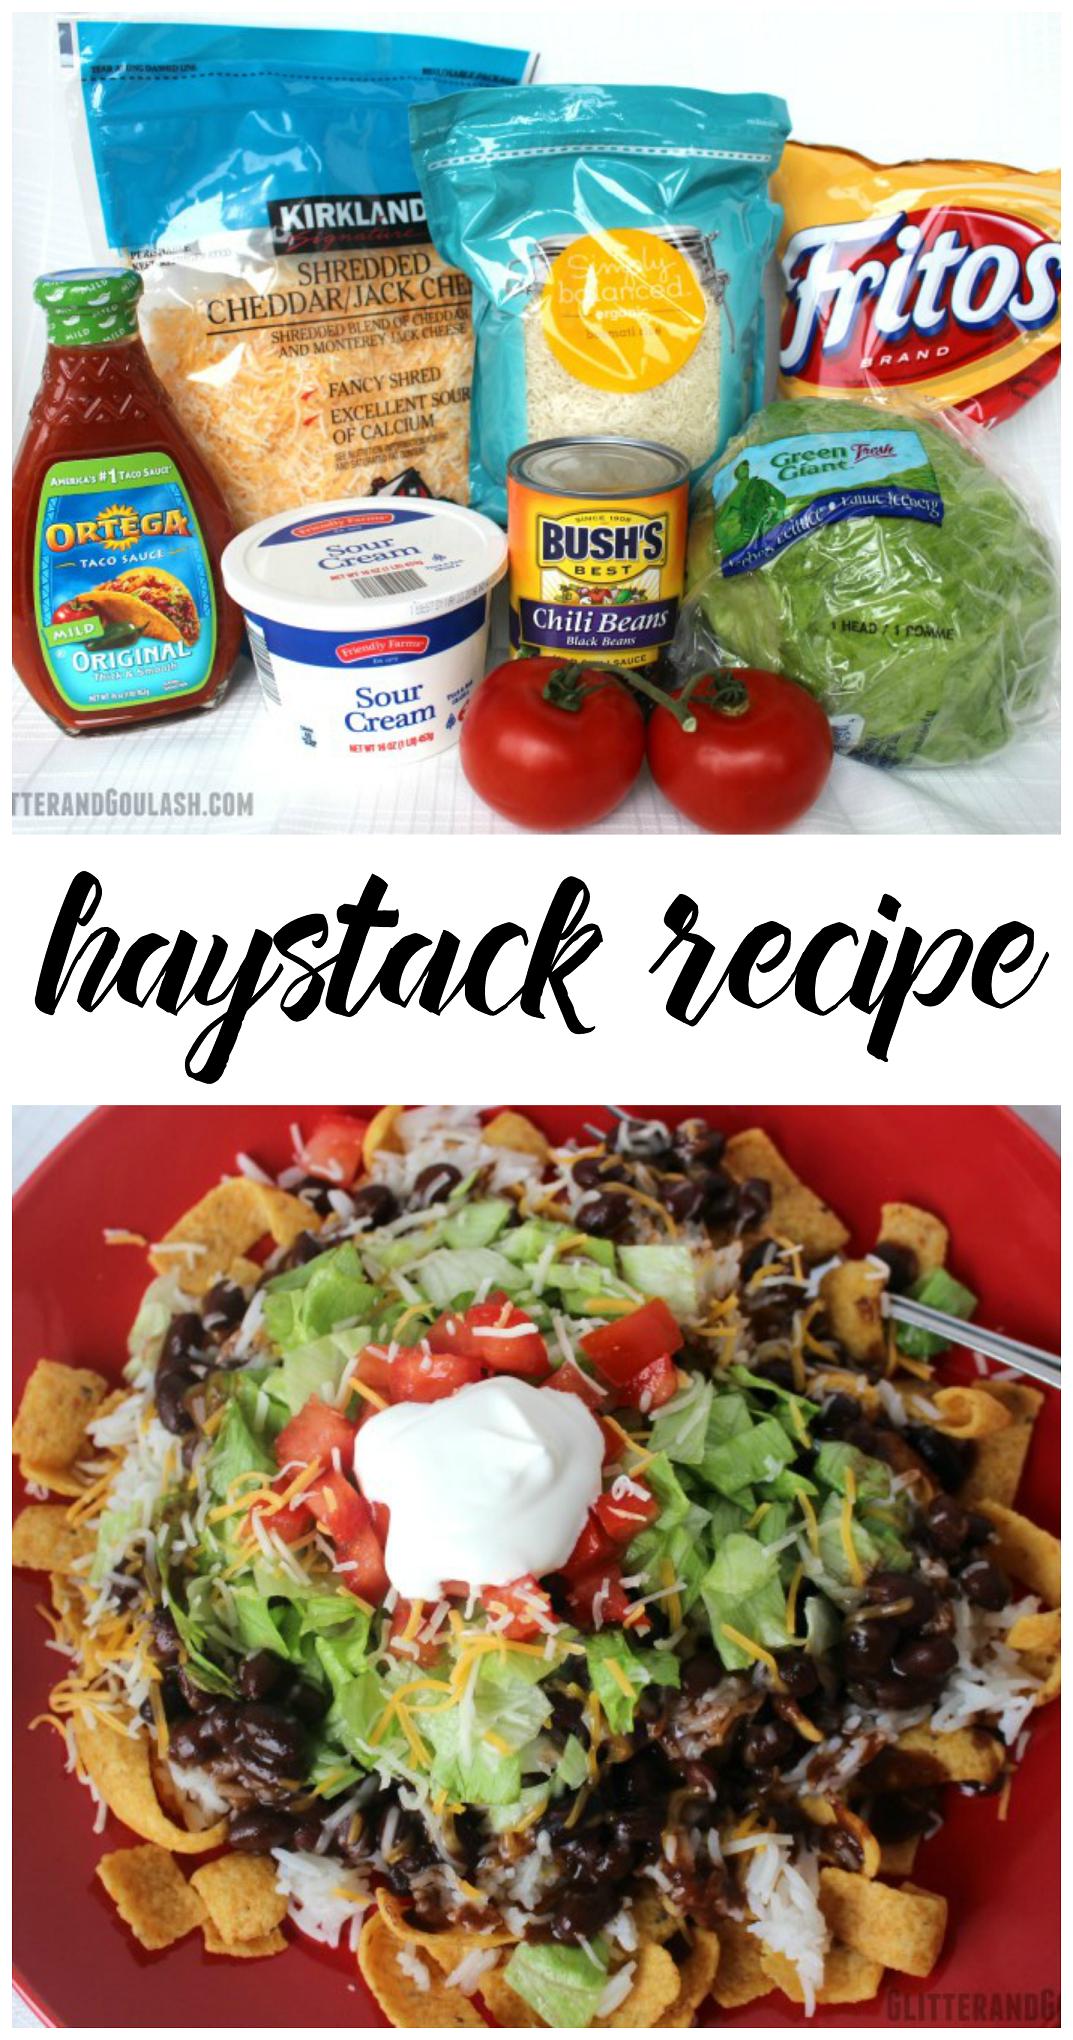 Haystacks My Way Glitter And Goulash Recipes Haystacks Recipe Mexican Food Recipes